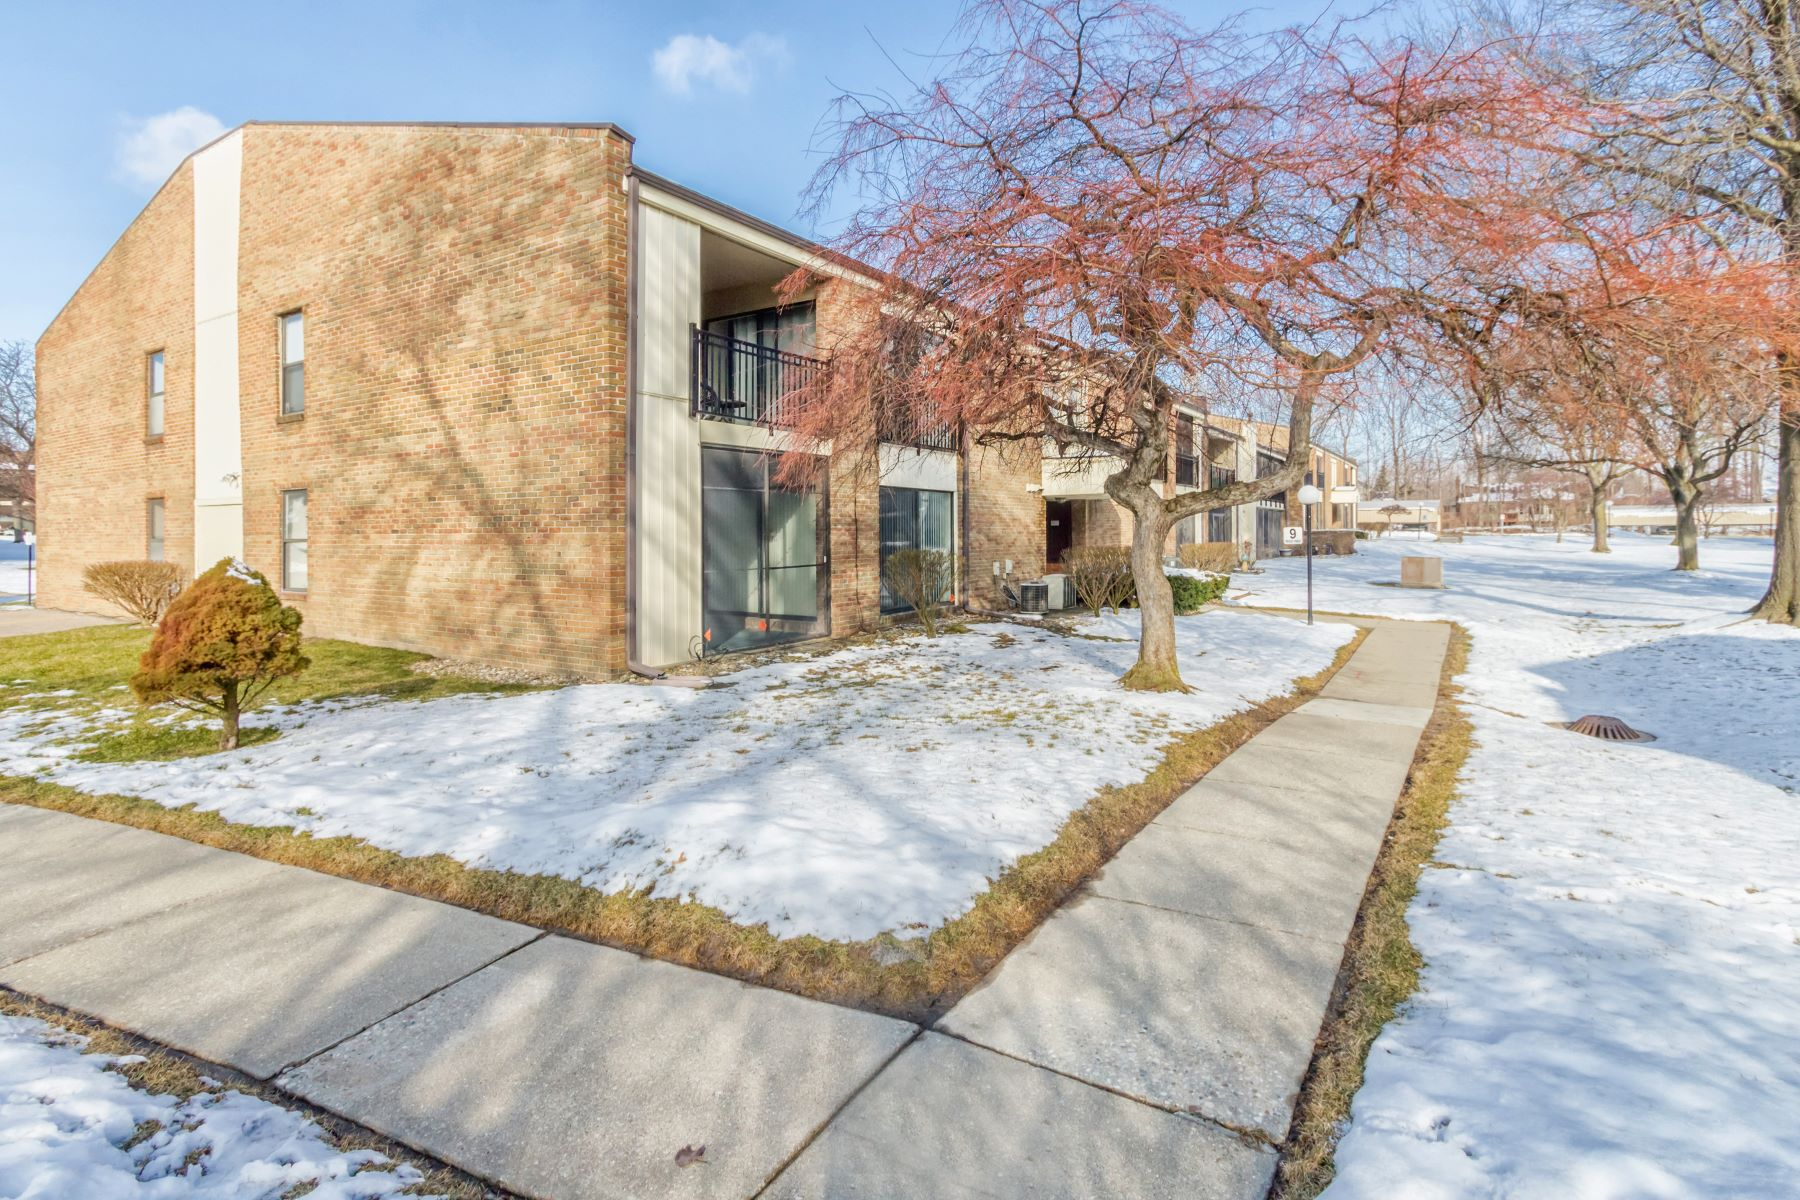 Condominiums for Sale at Livonia 18431 University Park Frive Livonia, Michigan 48152 United States